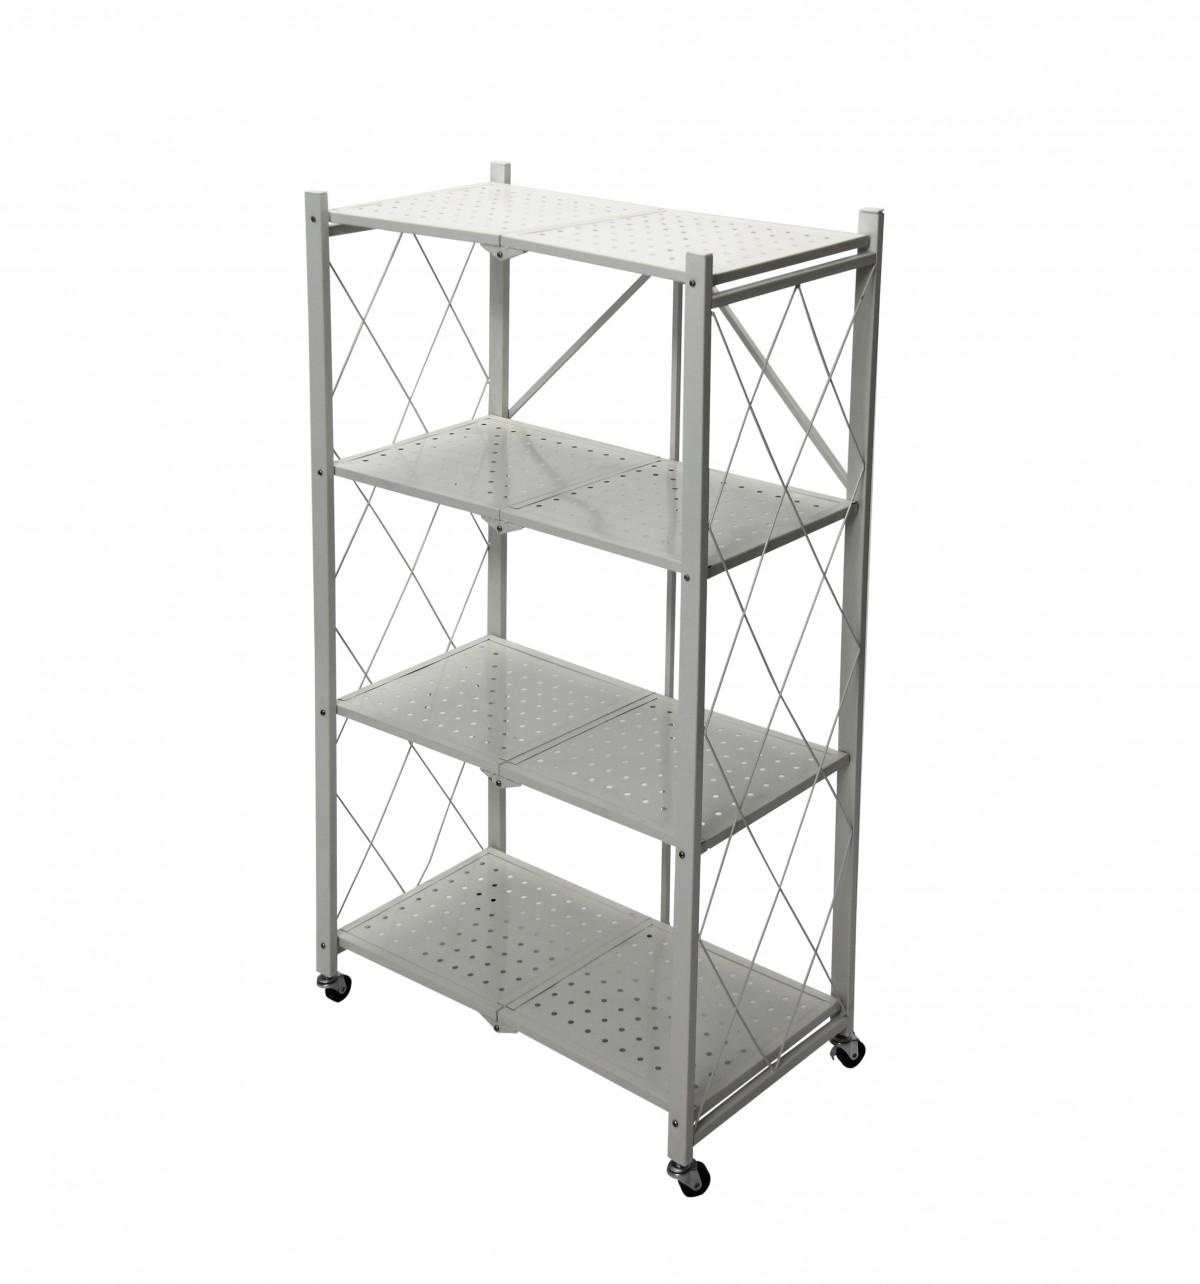 Fine Living Foldable Storage Rack-White Metal 4 La